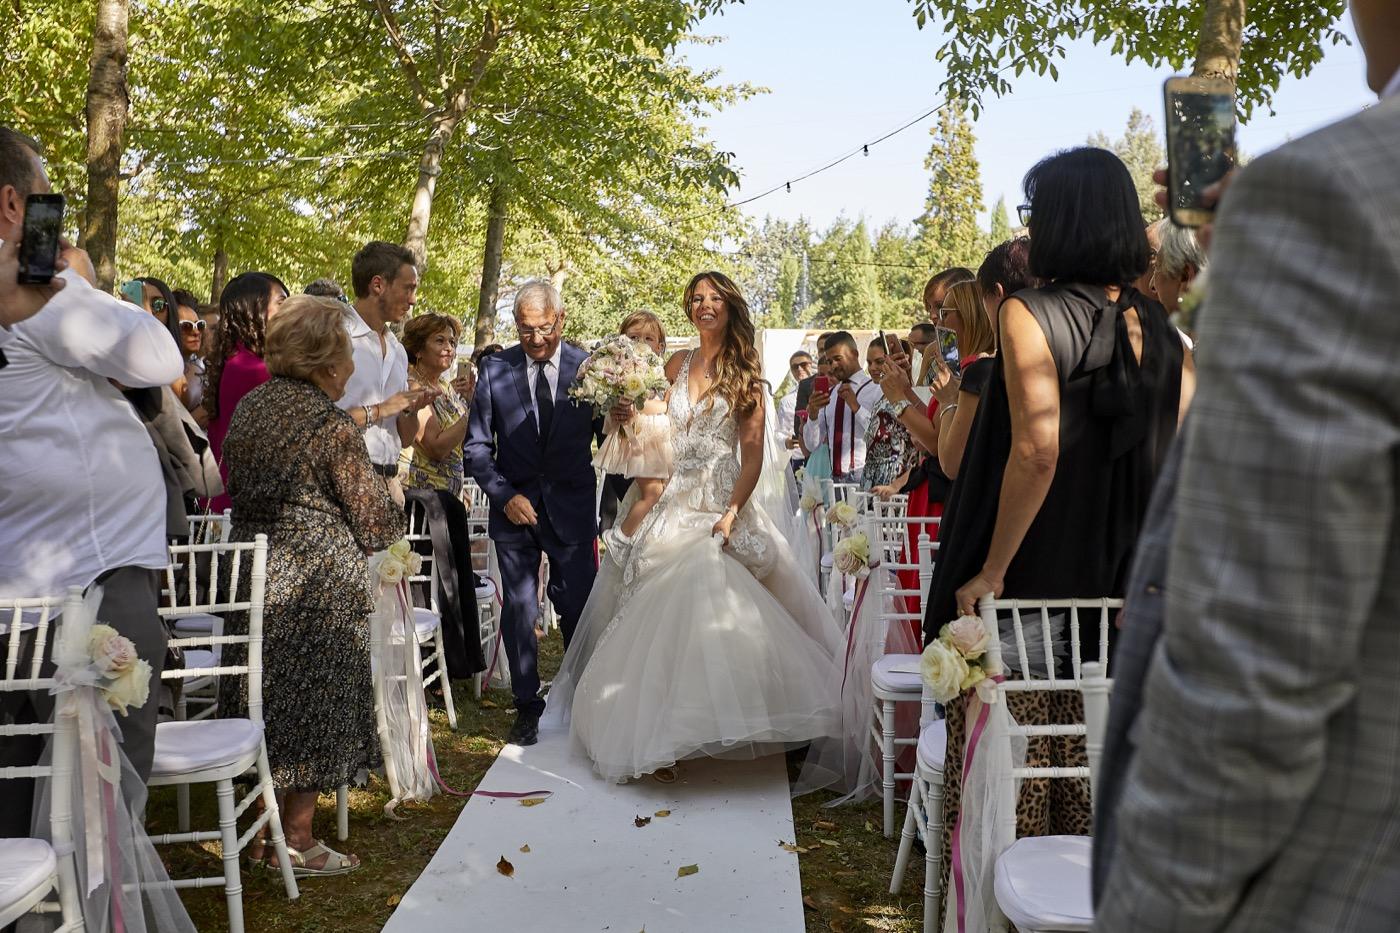 Claudio-Coppola-wedding-photographer-la-scuderia-eventi-preparativi-la-rosetta-perugia-47